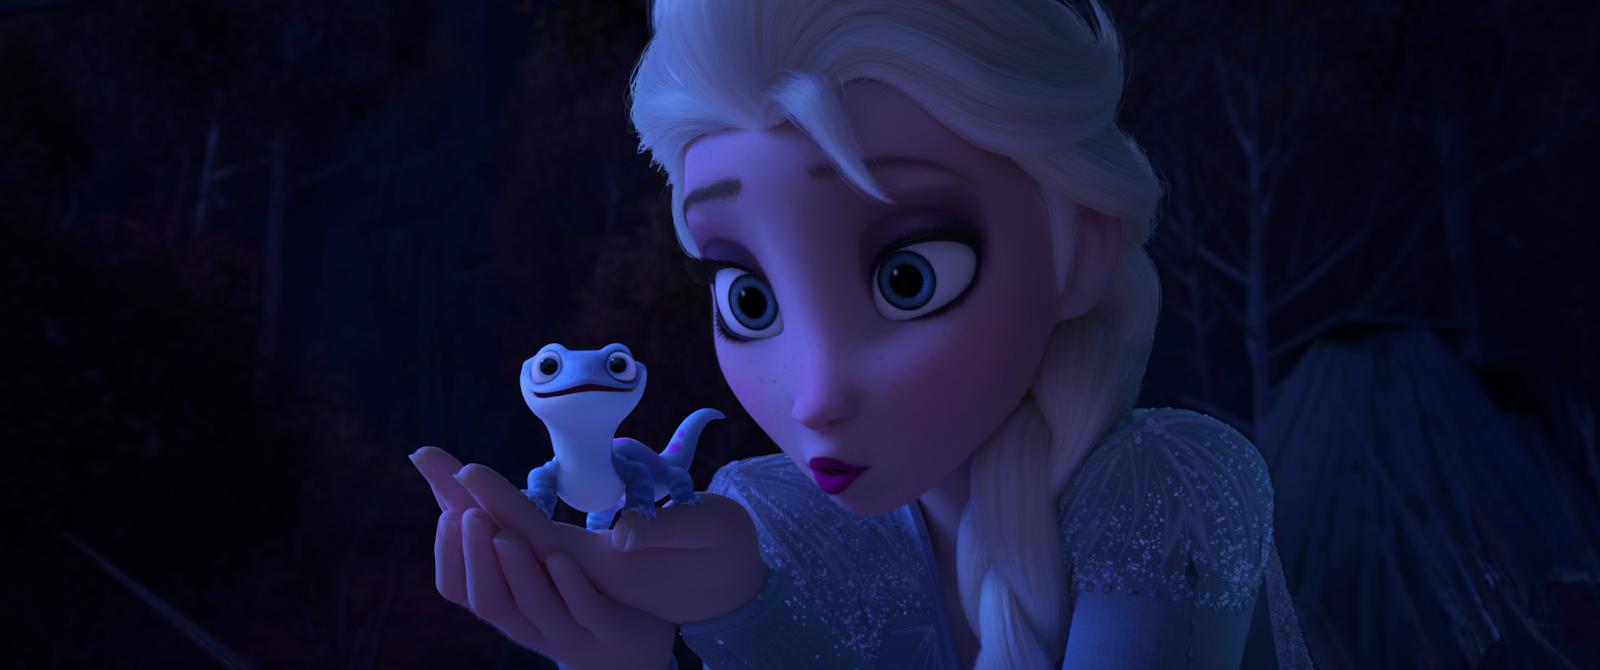 Frozen 2 (2019) 4K UHD 2160p Latino